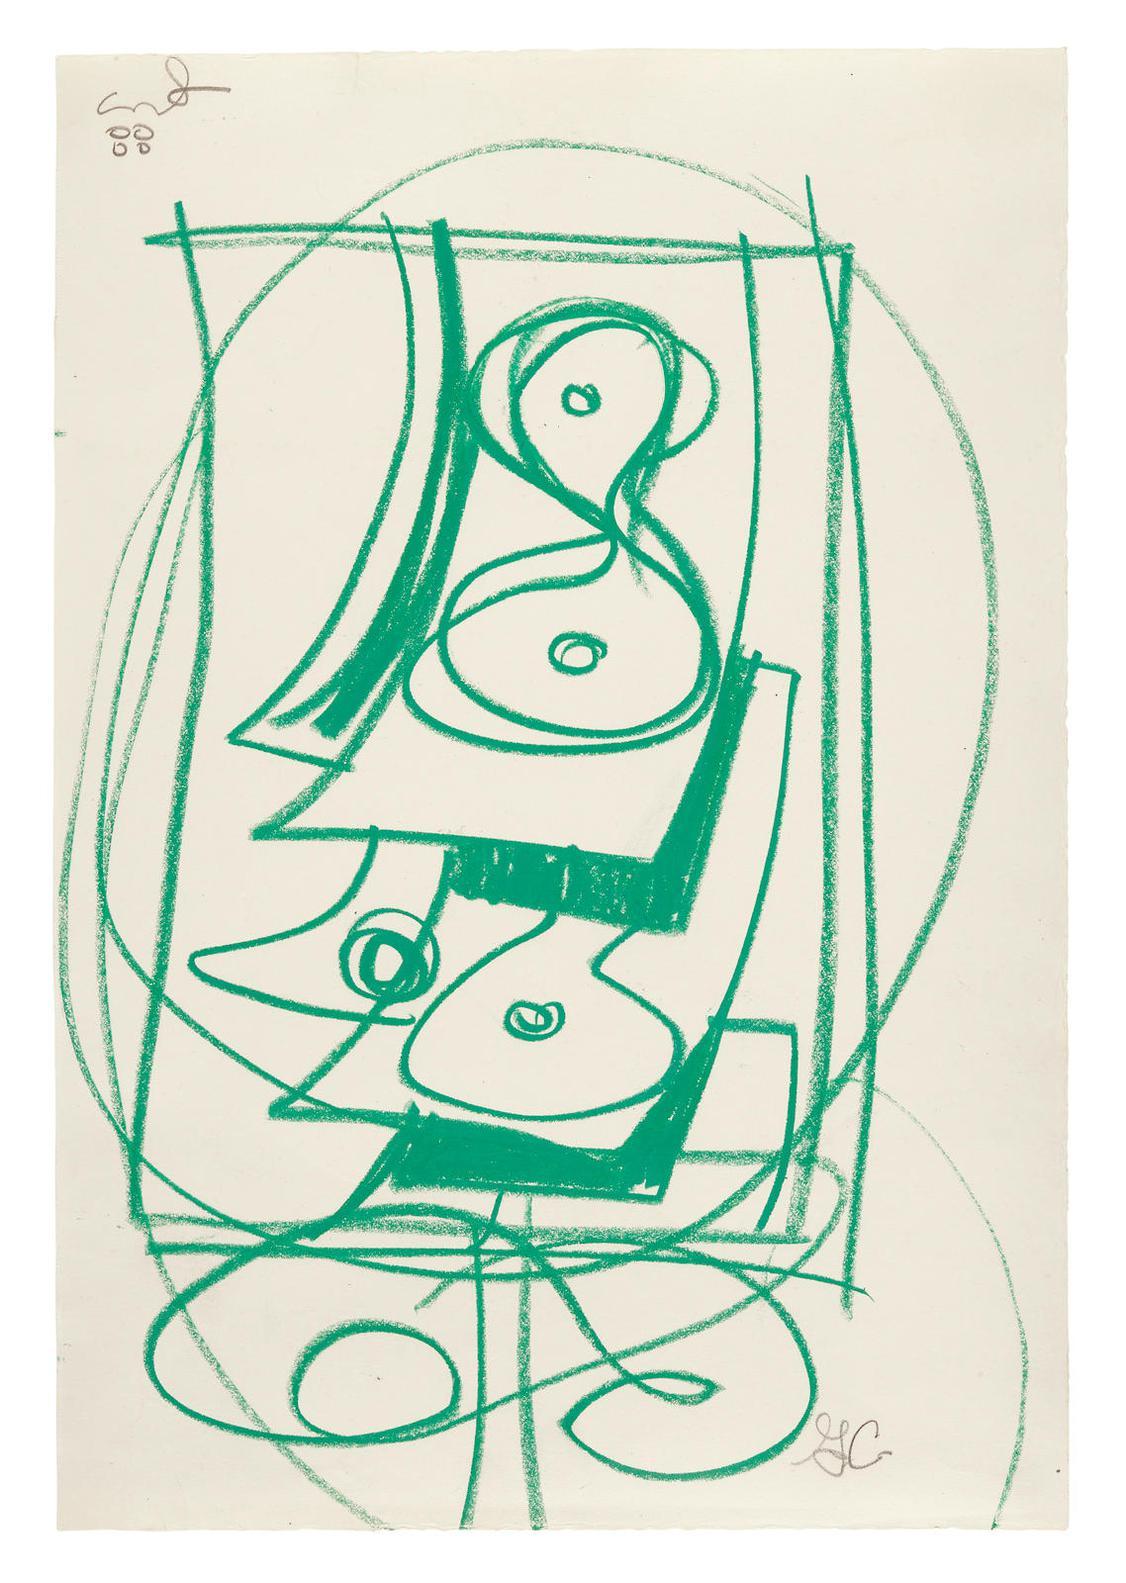 George Condo-Untitled-1988